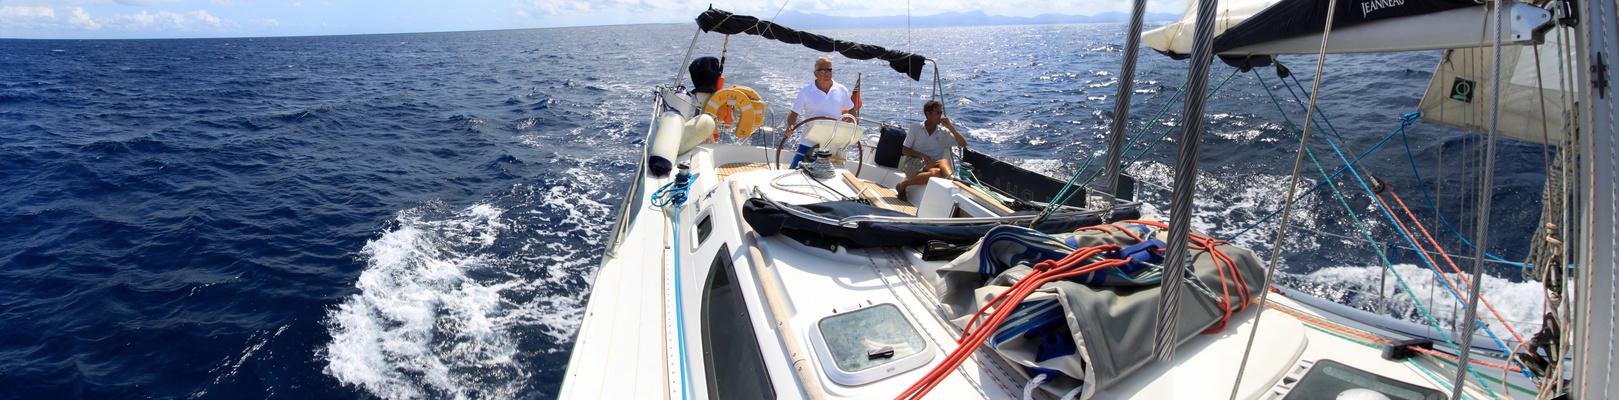 A1 - Sailing Mallorca